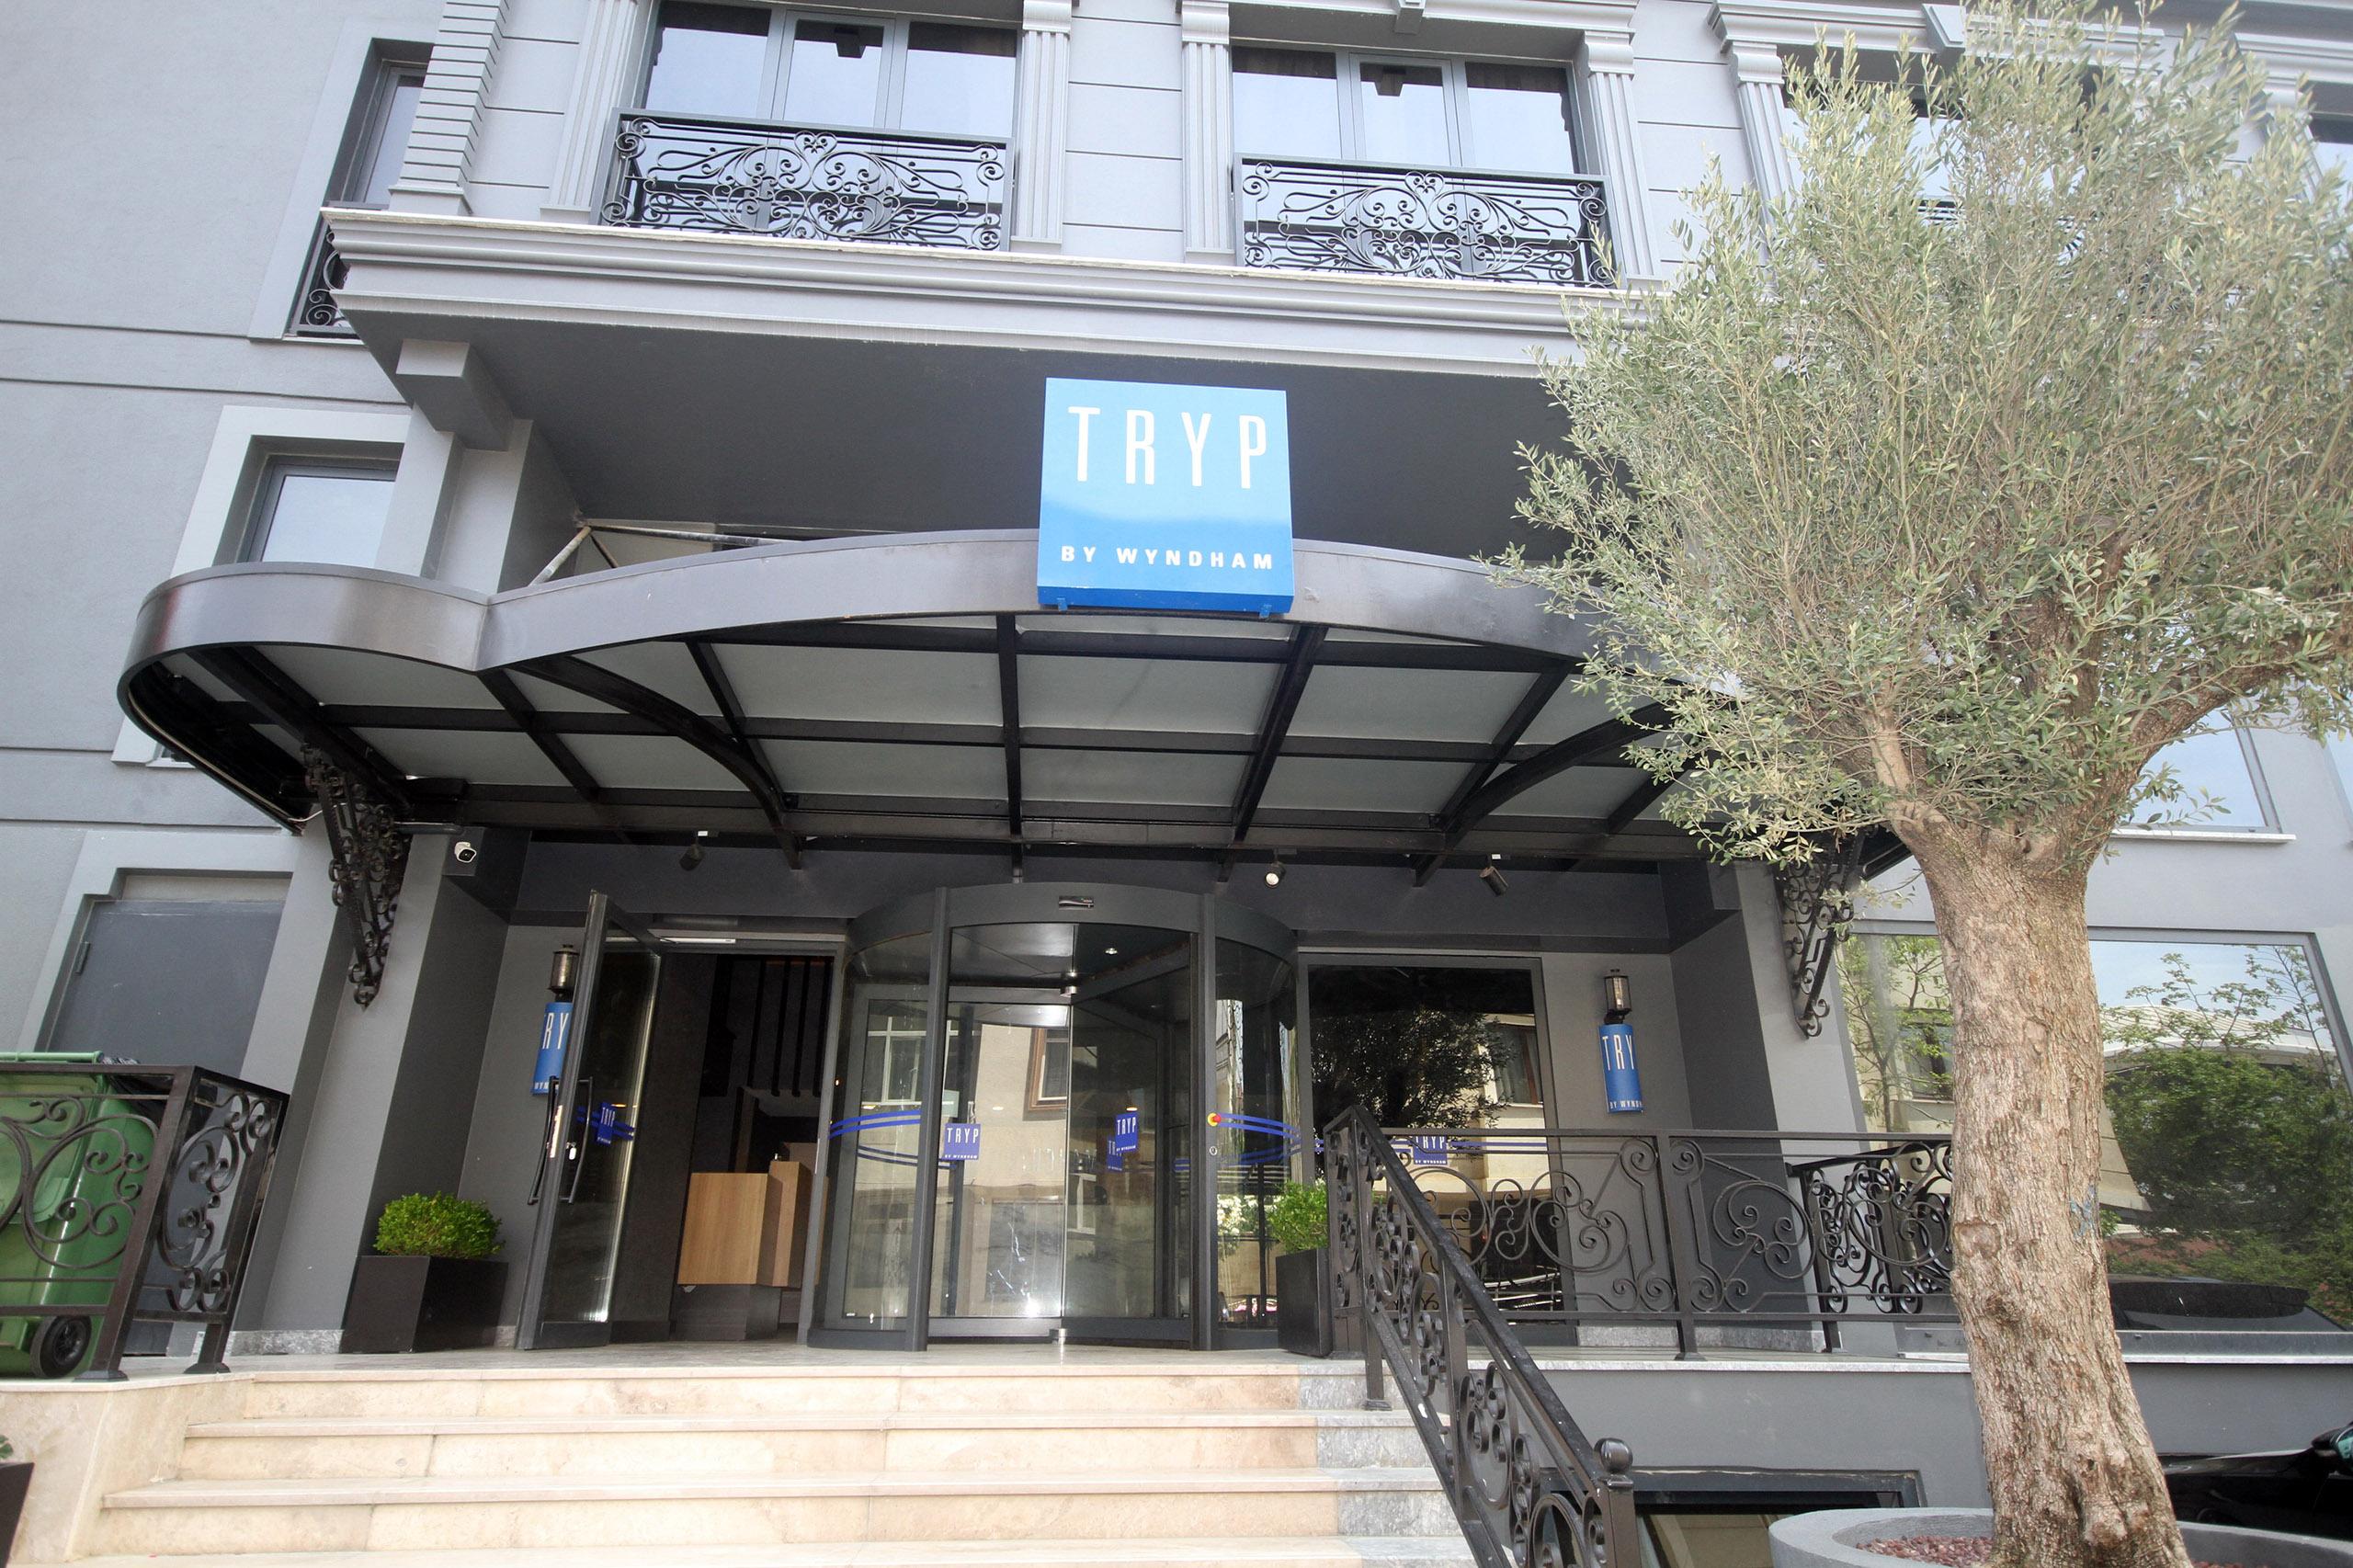 Tryp by Wyndham Istanbul Atasehir exterior view